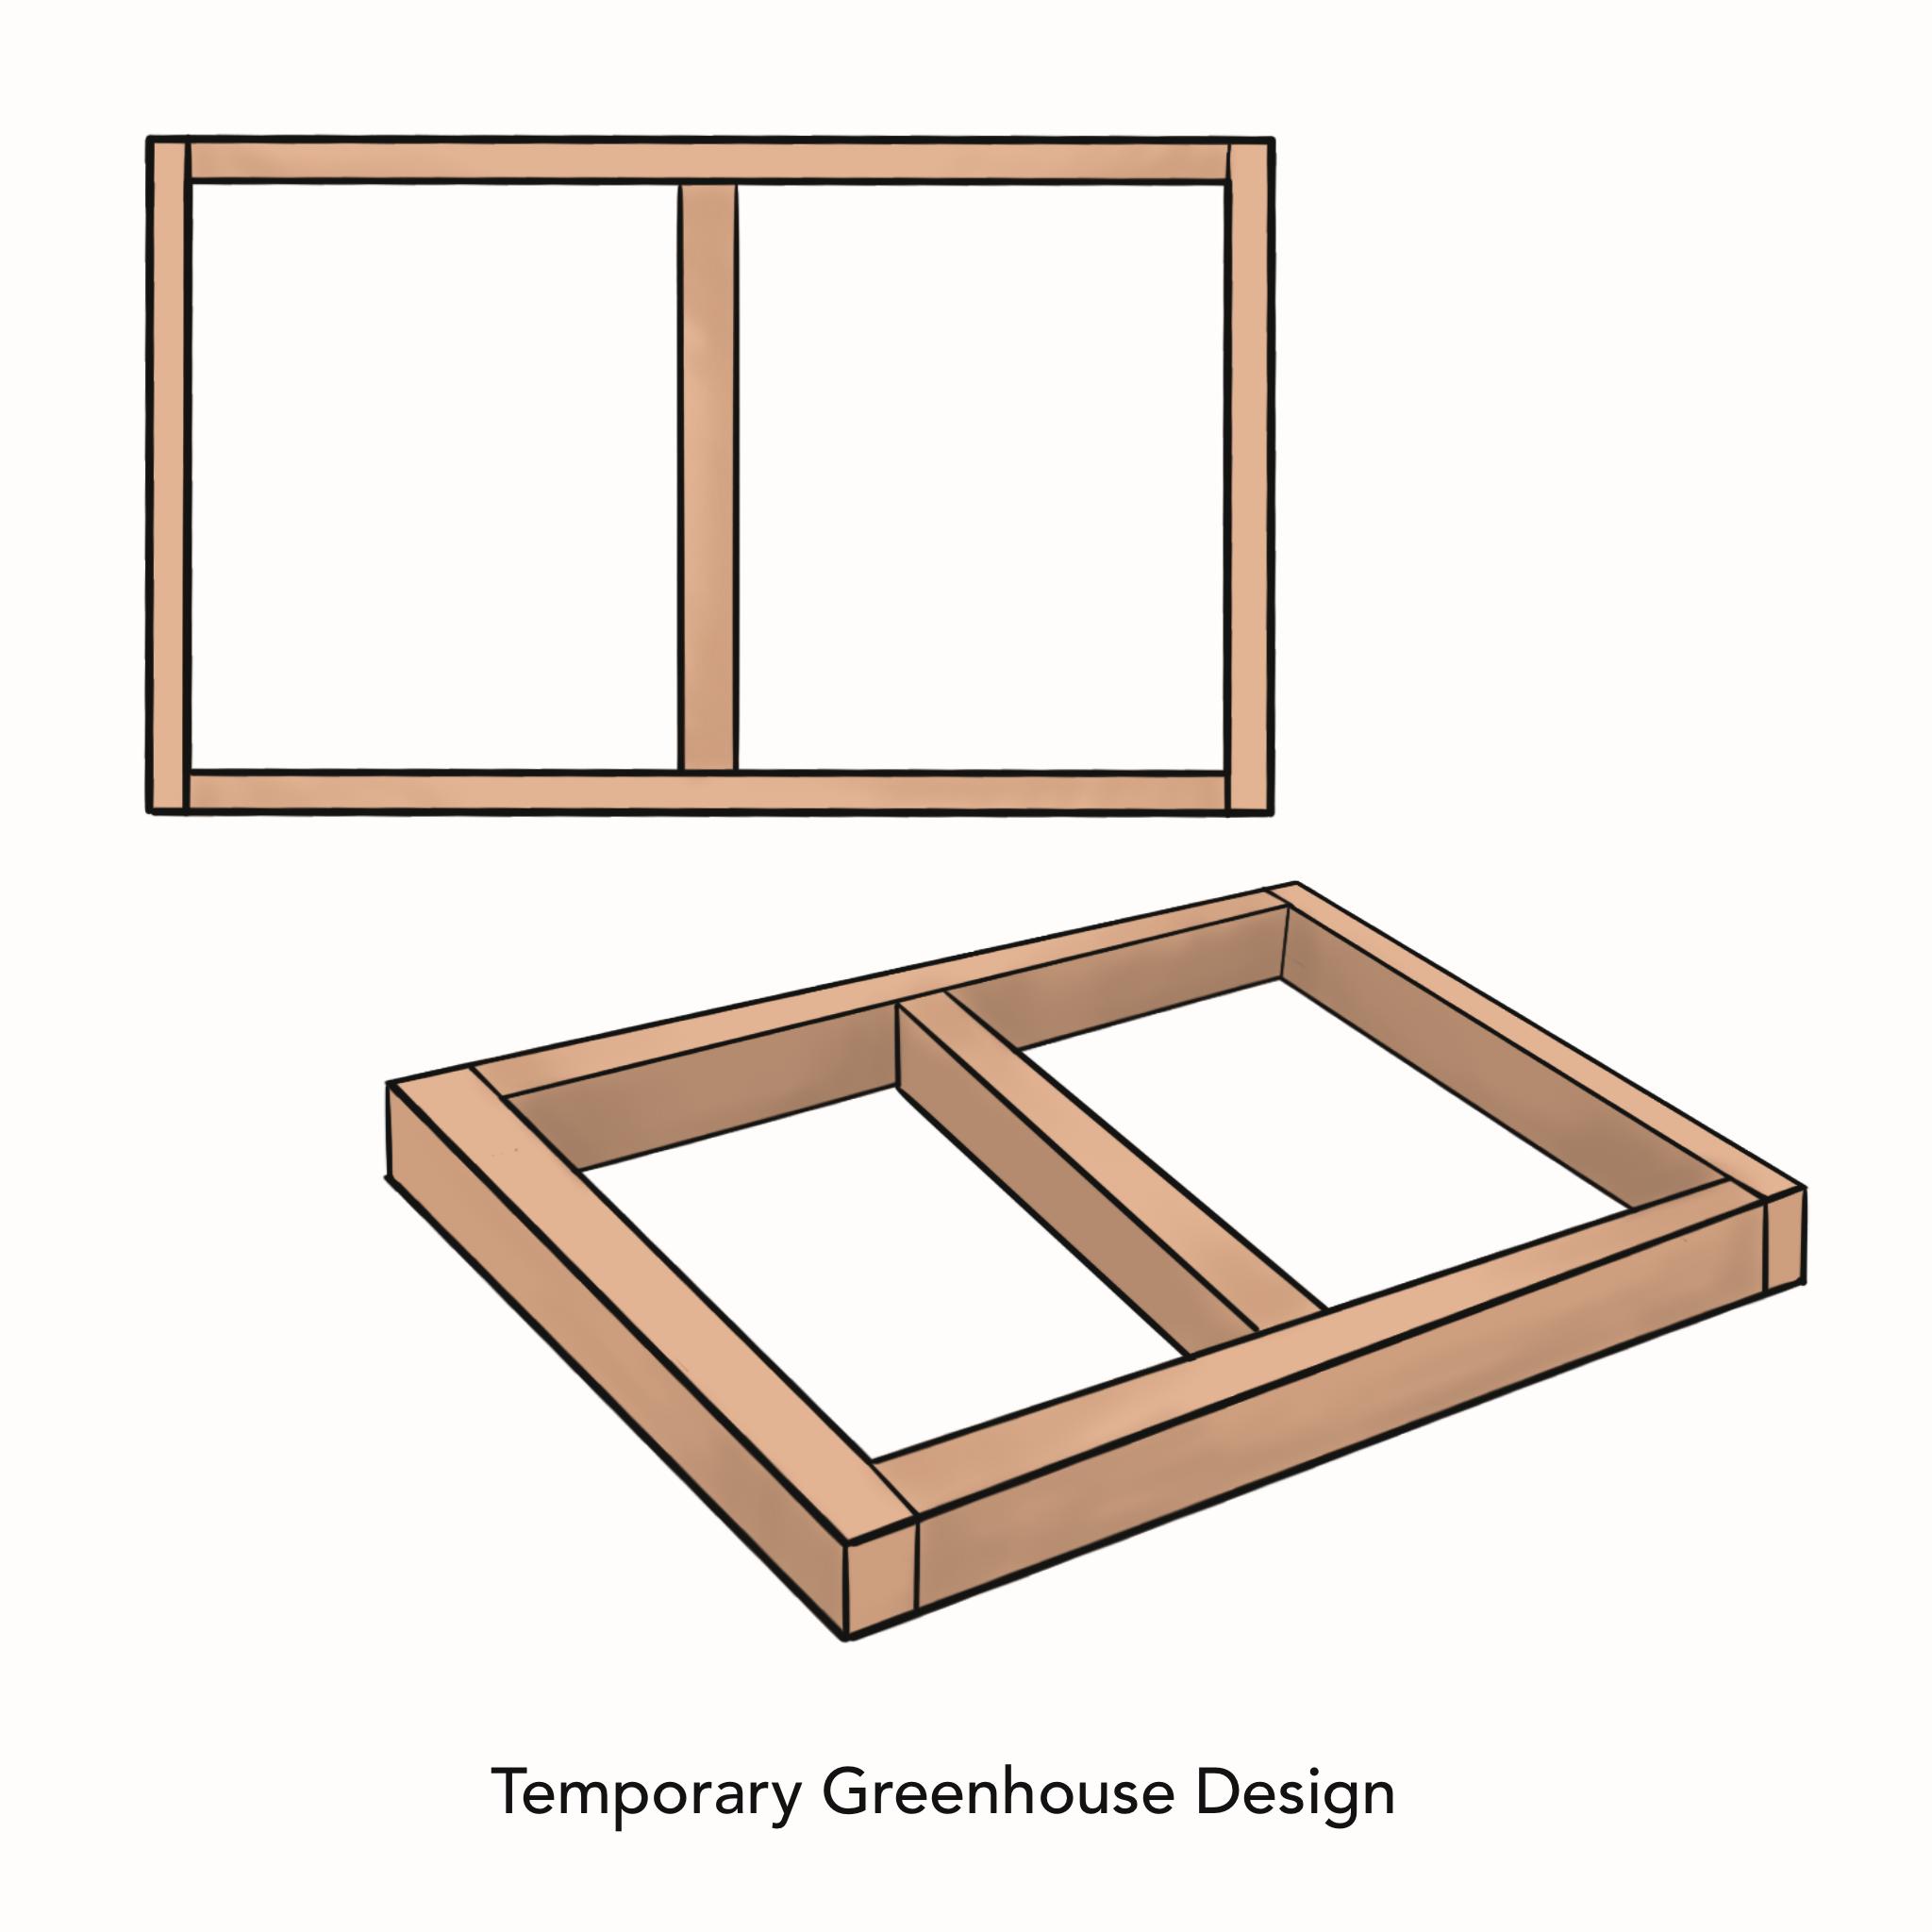 Temporary greenhouse design